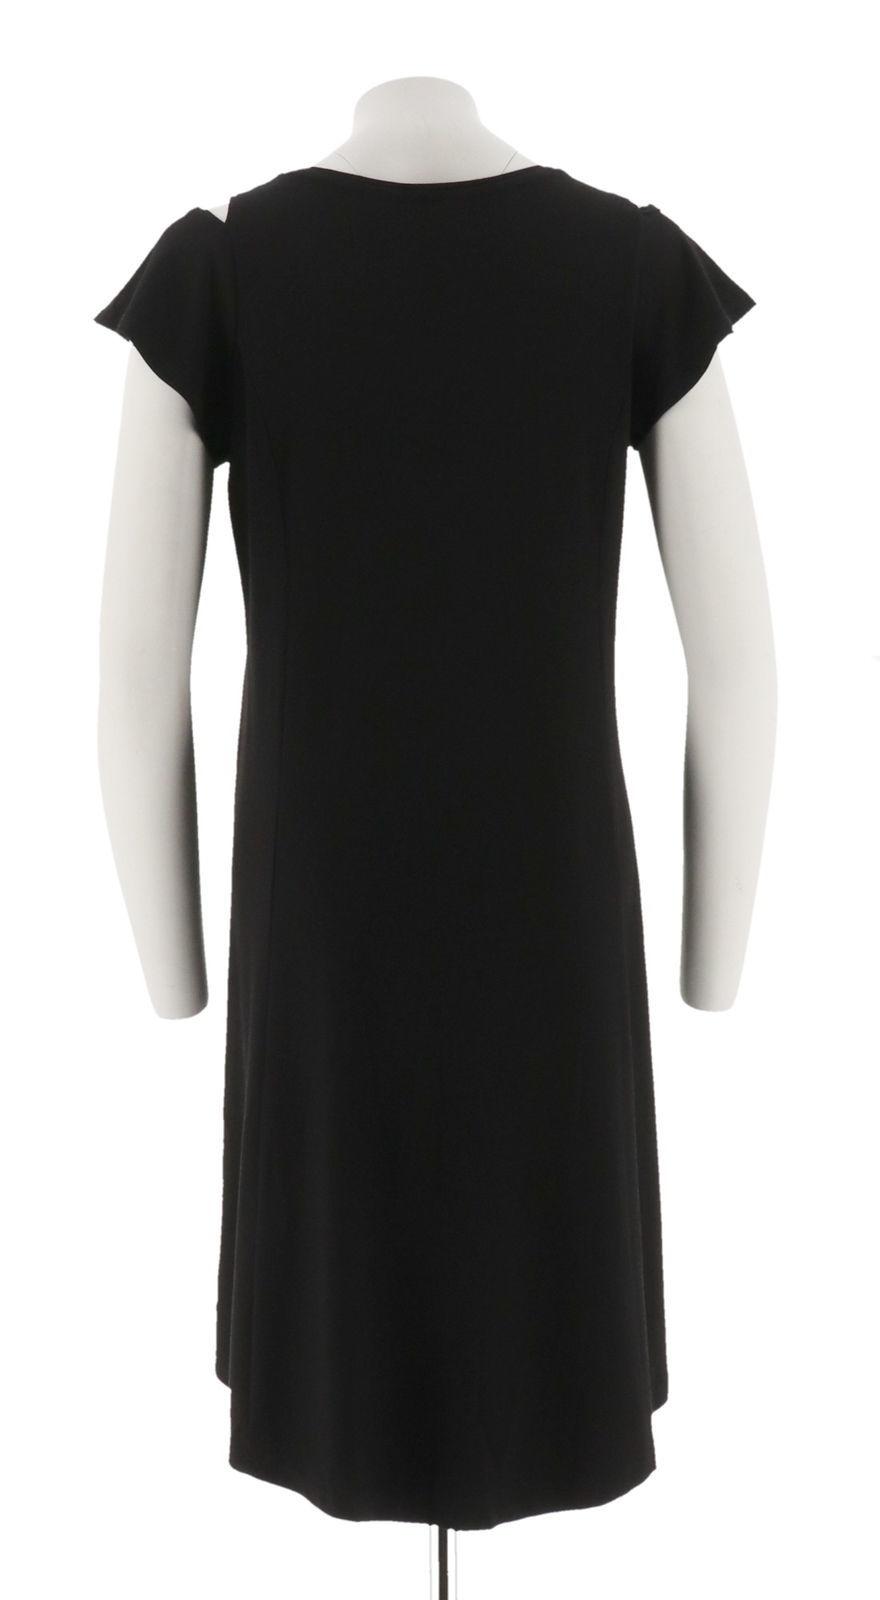 H Halston Petite Knit Crepe Dress Cutout Black PS NEW A308103 image 3